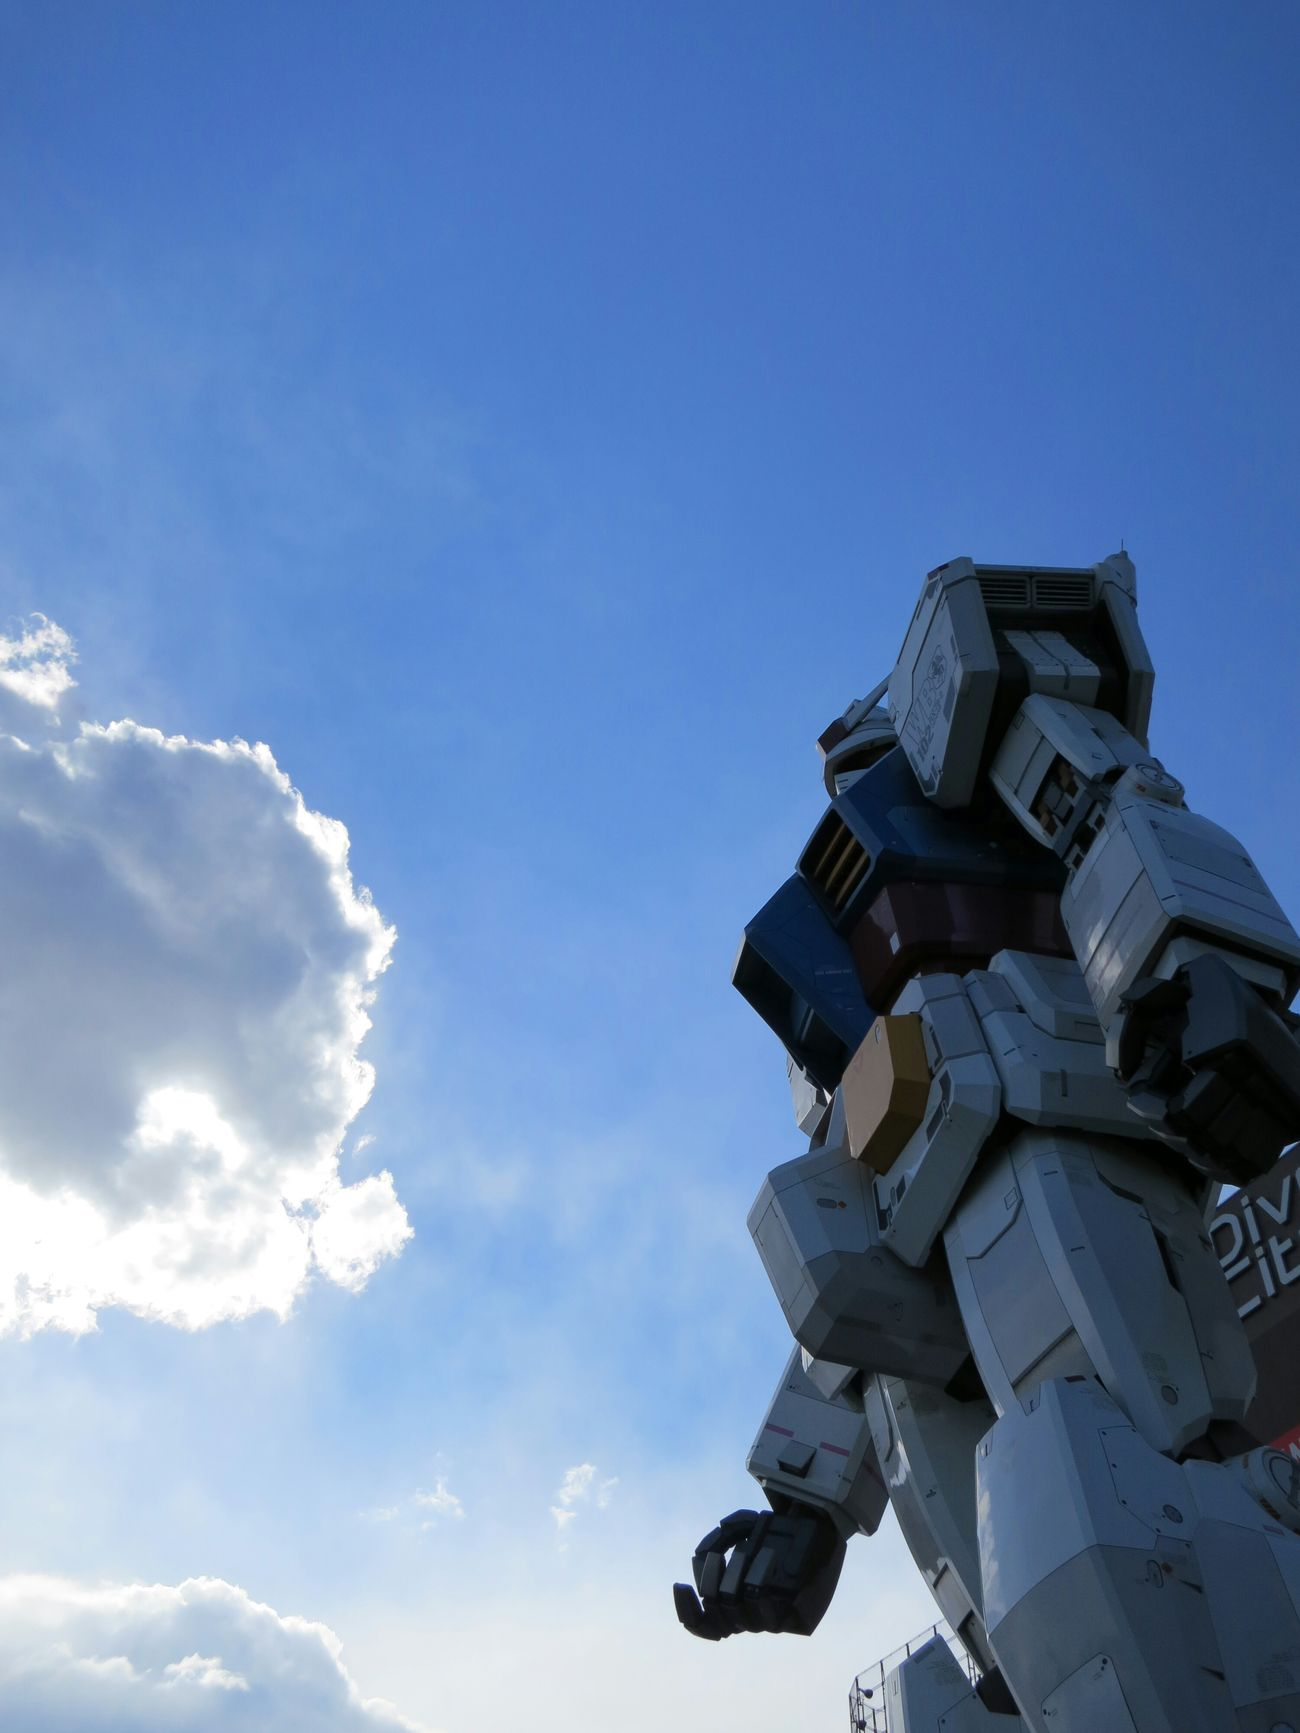 C'mon. Gundam